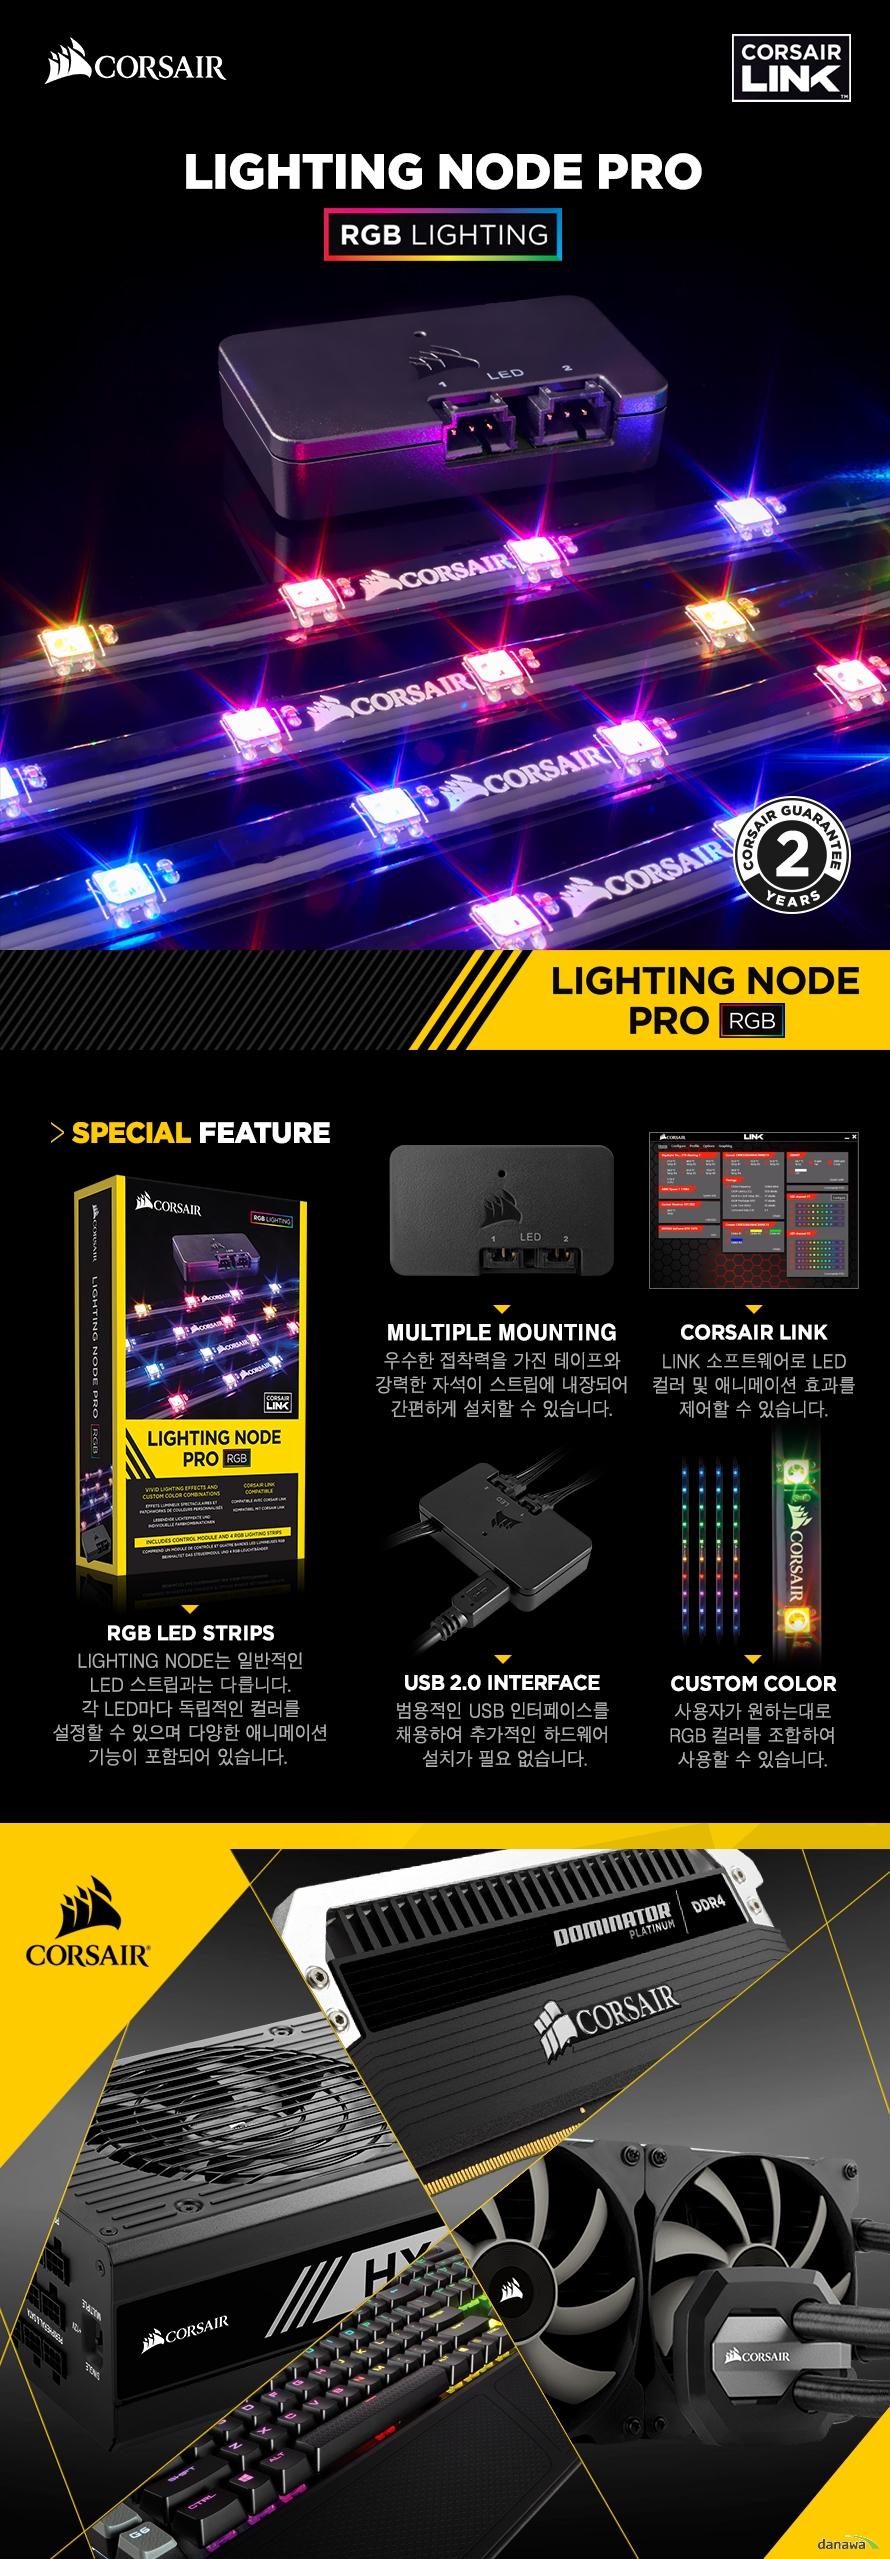 RGB LED StripsLIGHTING NODE는 일반적인LED 스트립과는 다릅니다.각 LED마다 독립적인 컬러를설정할 수 있으며 다양한 애니메이션기능이 포함되어 있습니다. Multiple Mounting우수한 접착력을 가진 테이프와강력한 자석이 스트립에 내장되어간편하게 설치할 수 있습니다.Corsair LinkLINK 소프트웨어로 LED컬러 및 애니메이션 효과를제어할 수 있습니다.USB 2.0 Interface범용적인 USB 인터페이스를채용하여 추가적인 하드웨어설치가 필요 없습니다.Custom Color사용자가 원하는대로RGB 컬러를 조합하여사용할 수 있습니다.